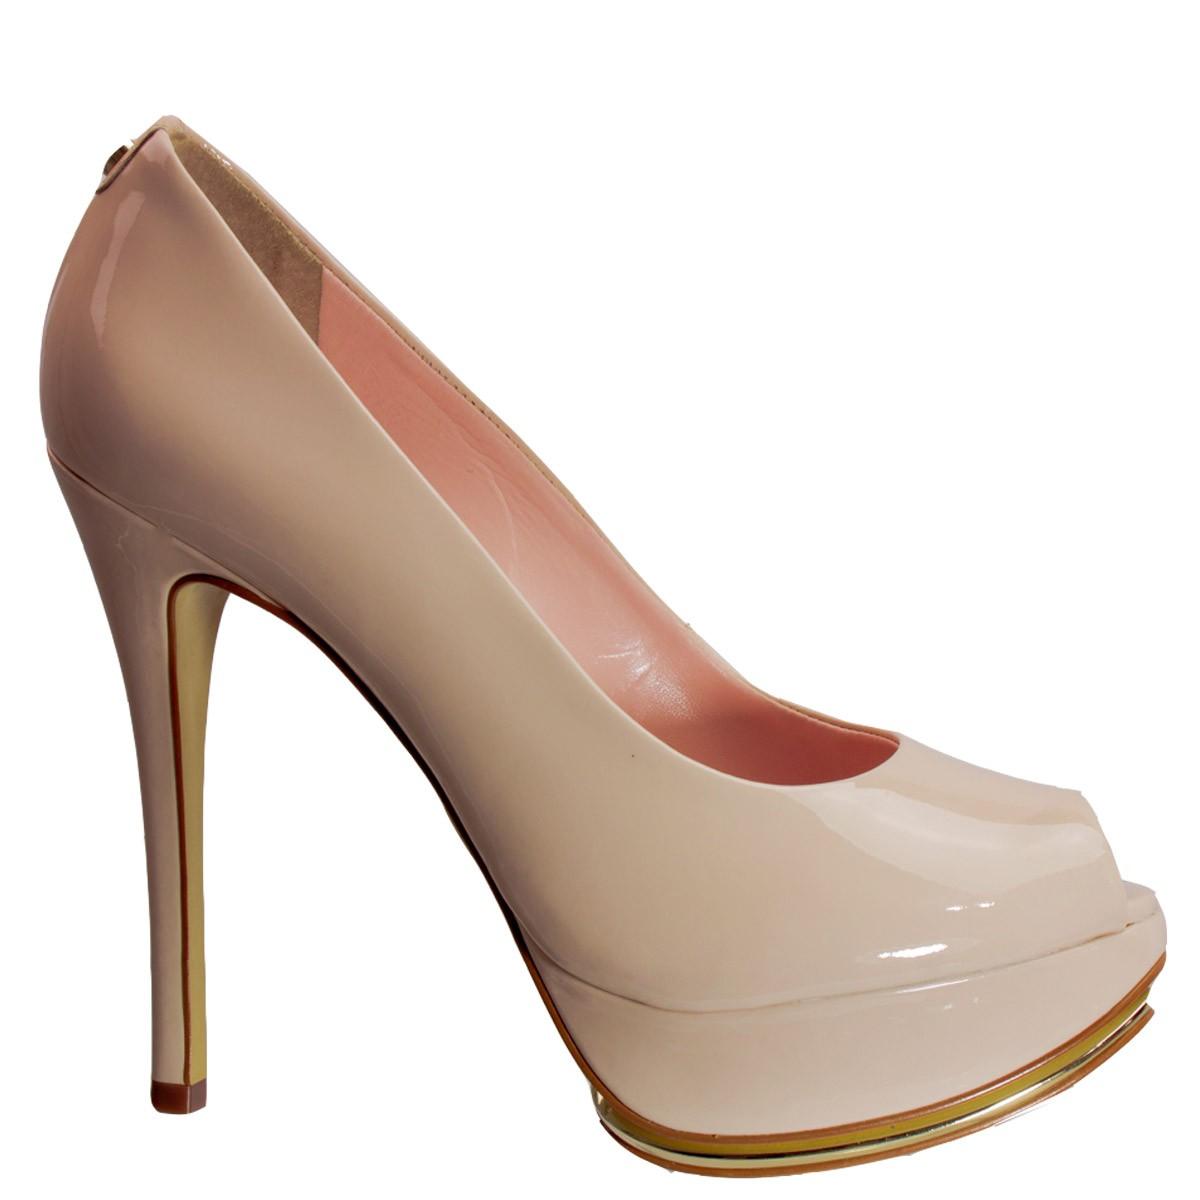 91872dac7d Bizz Store - Sapato Peep Toe Feminino Jorge Bischoff Salto Alto